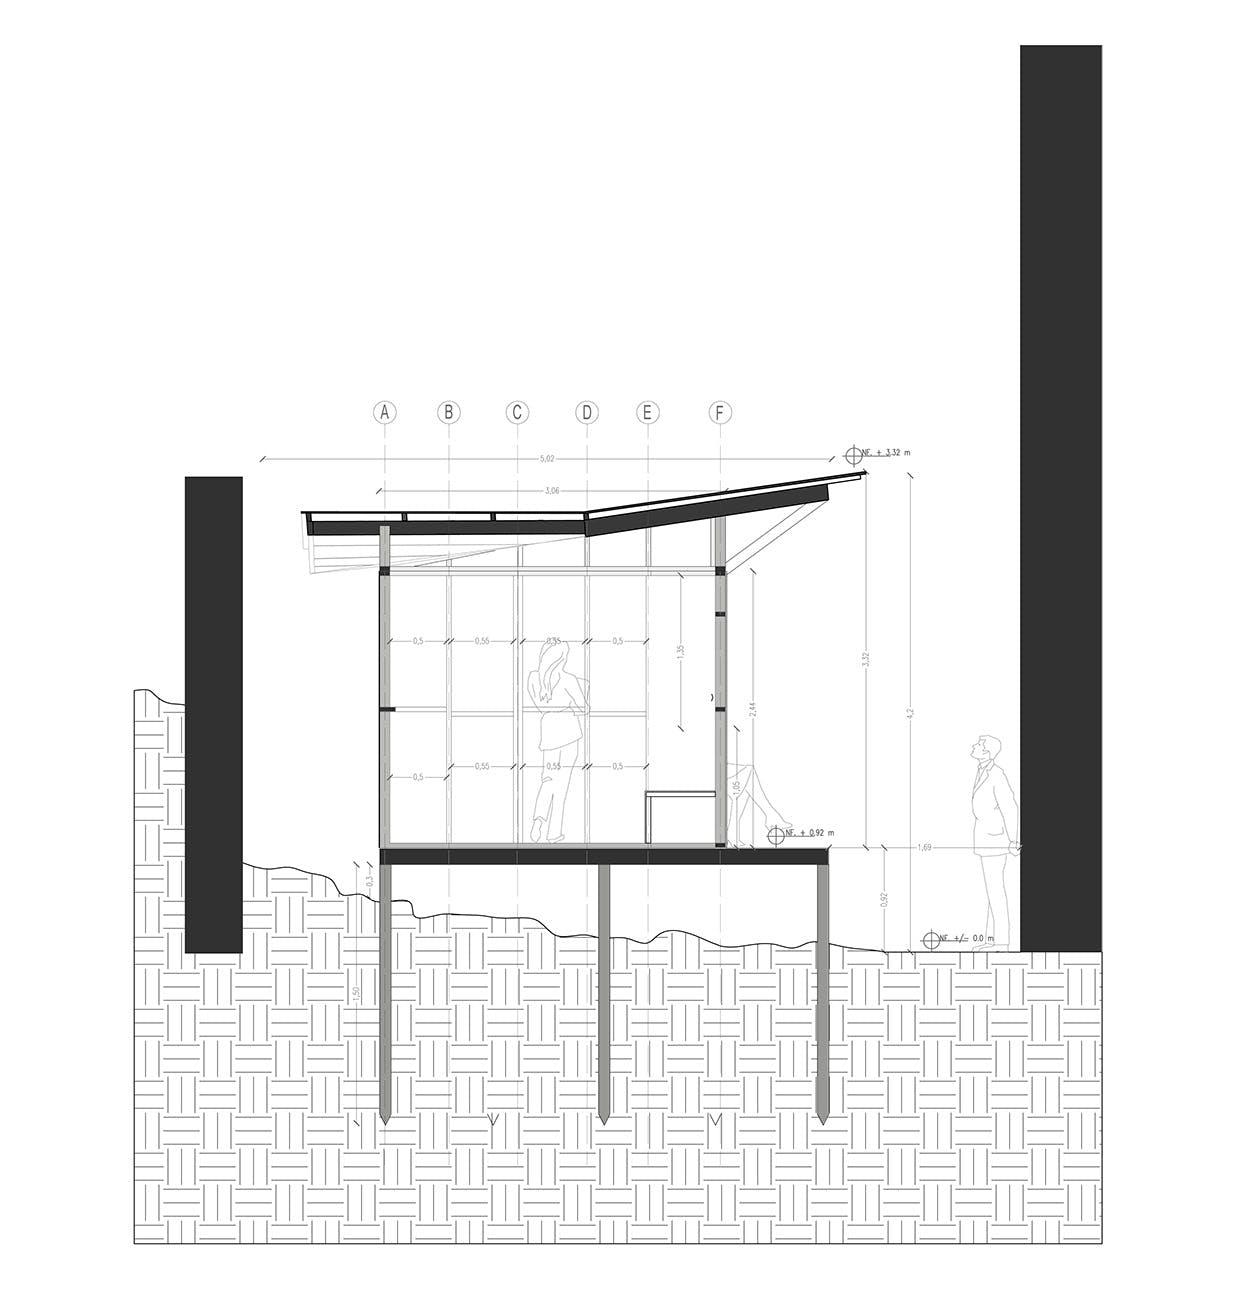 Mueble Habitable Daniel Arias Archinect # Gebrauchte Muebles